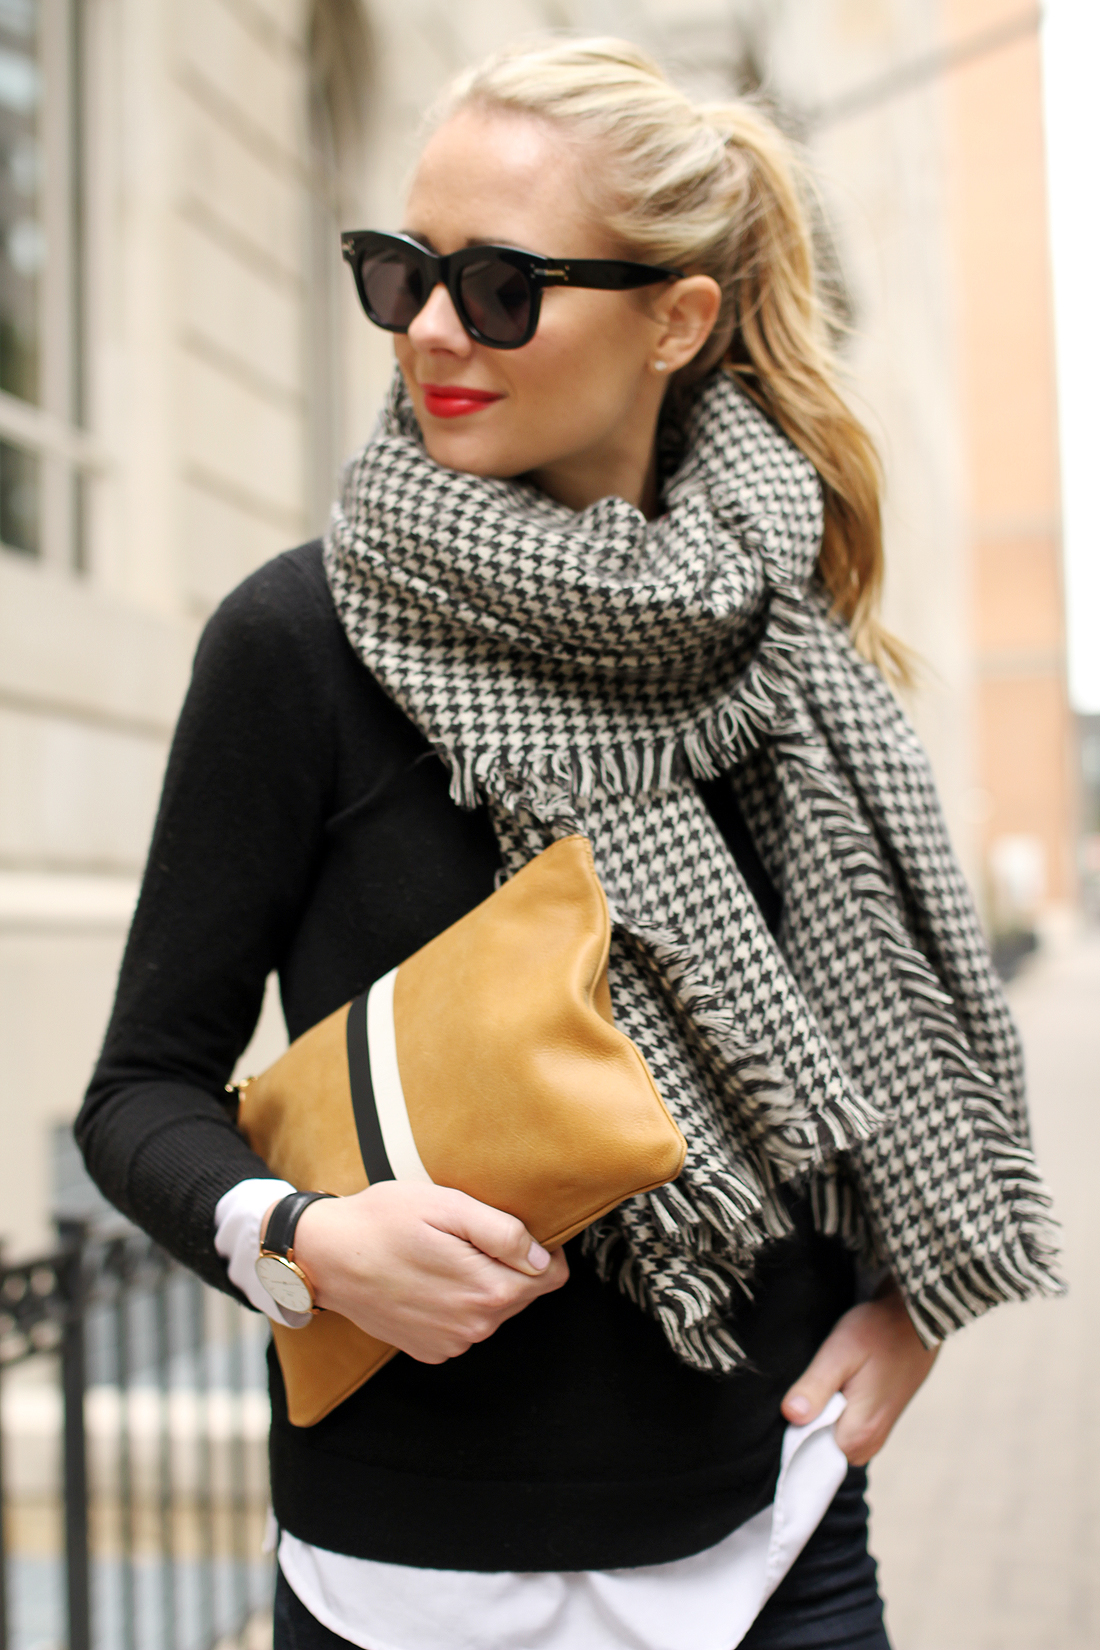 fashion-jackson-houndstooth-scarf-clare-v-clutch-celine-sunglasses-red-lipstick